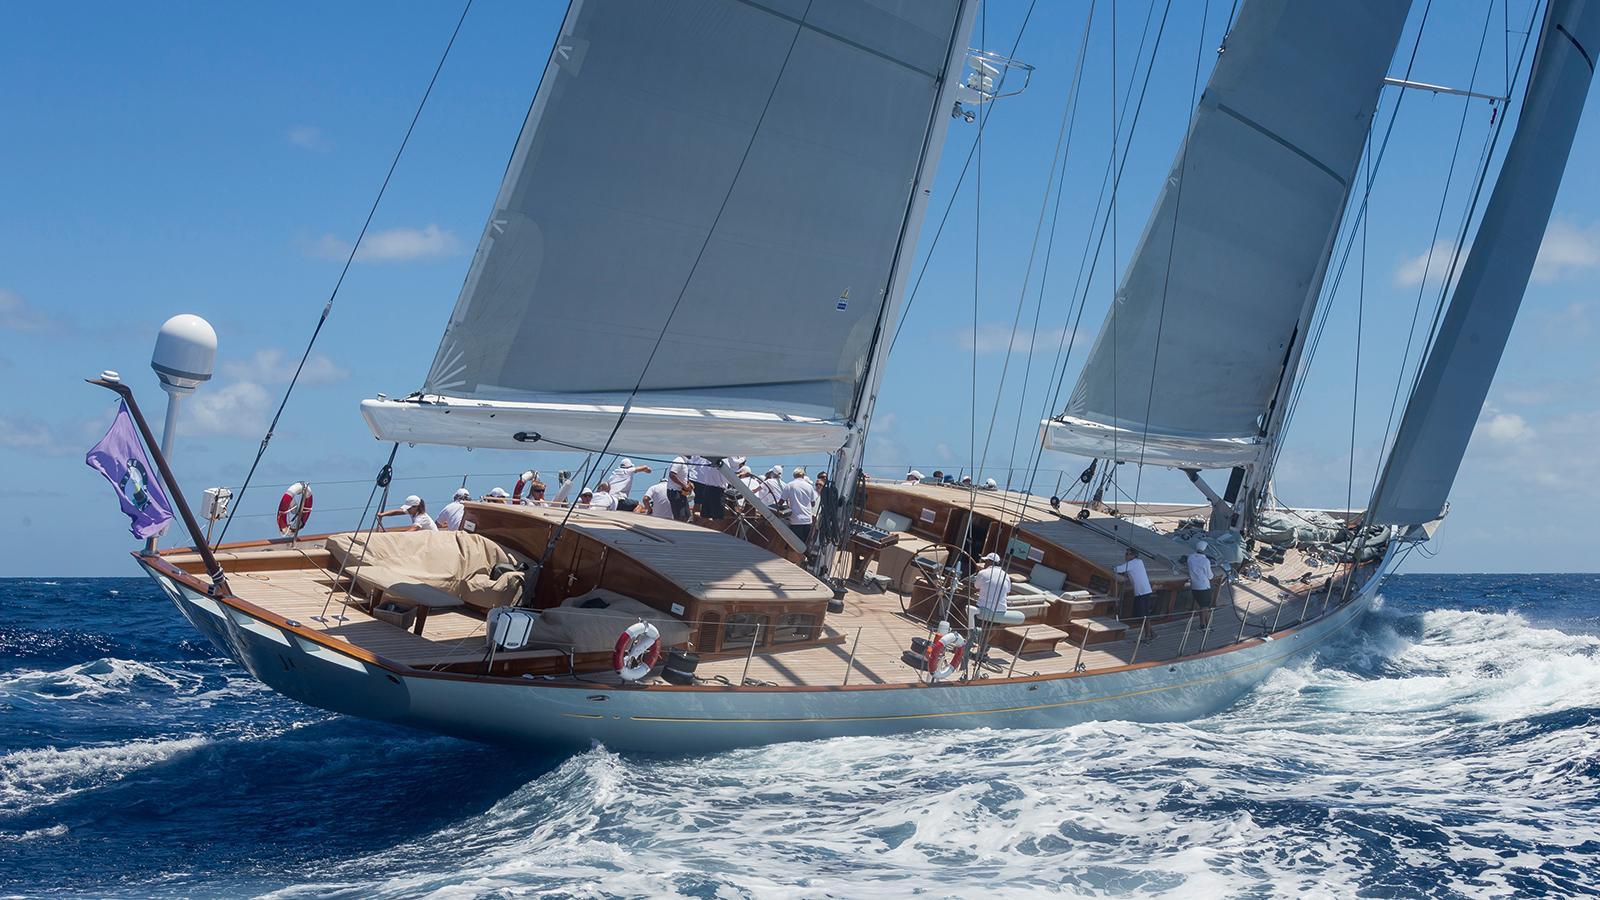 elfje-sailing-yacht-royal-huisman-2014-52m-cruising